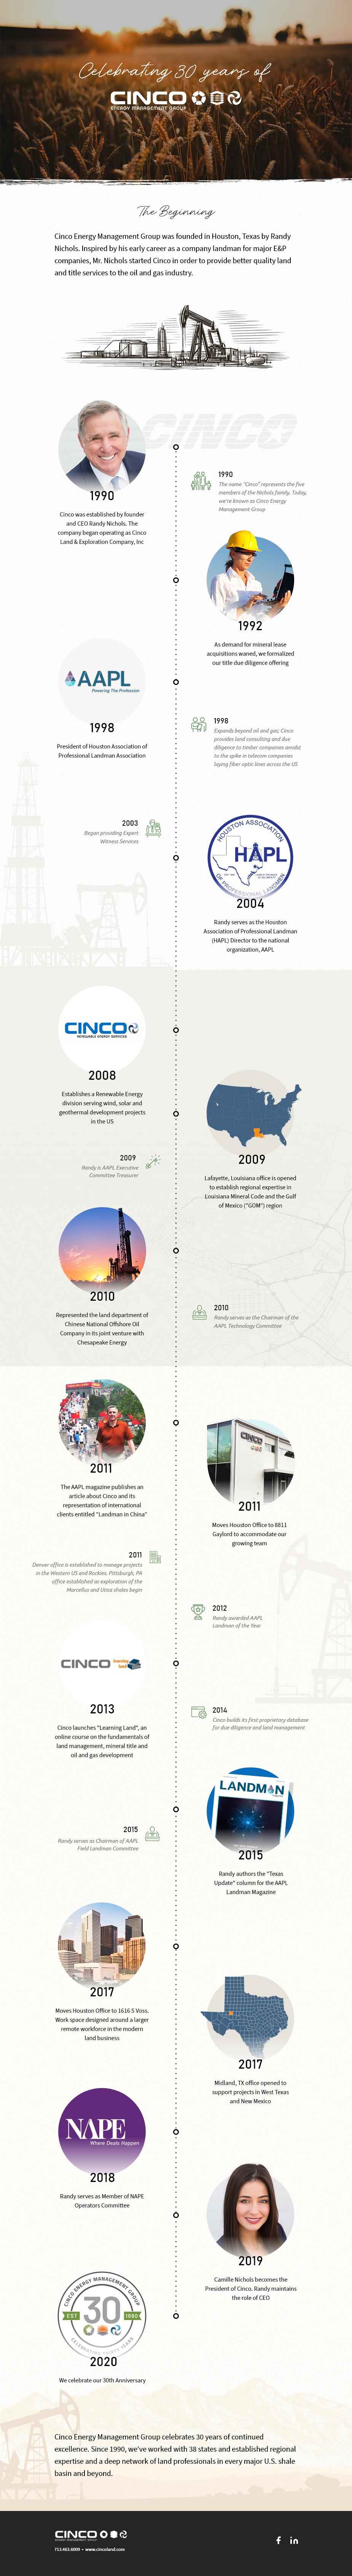 cinco-timeline-infographic-rev4